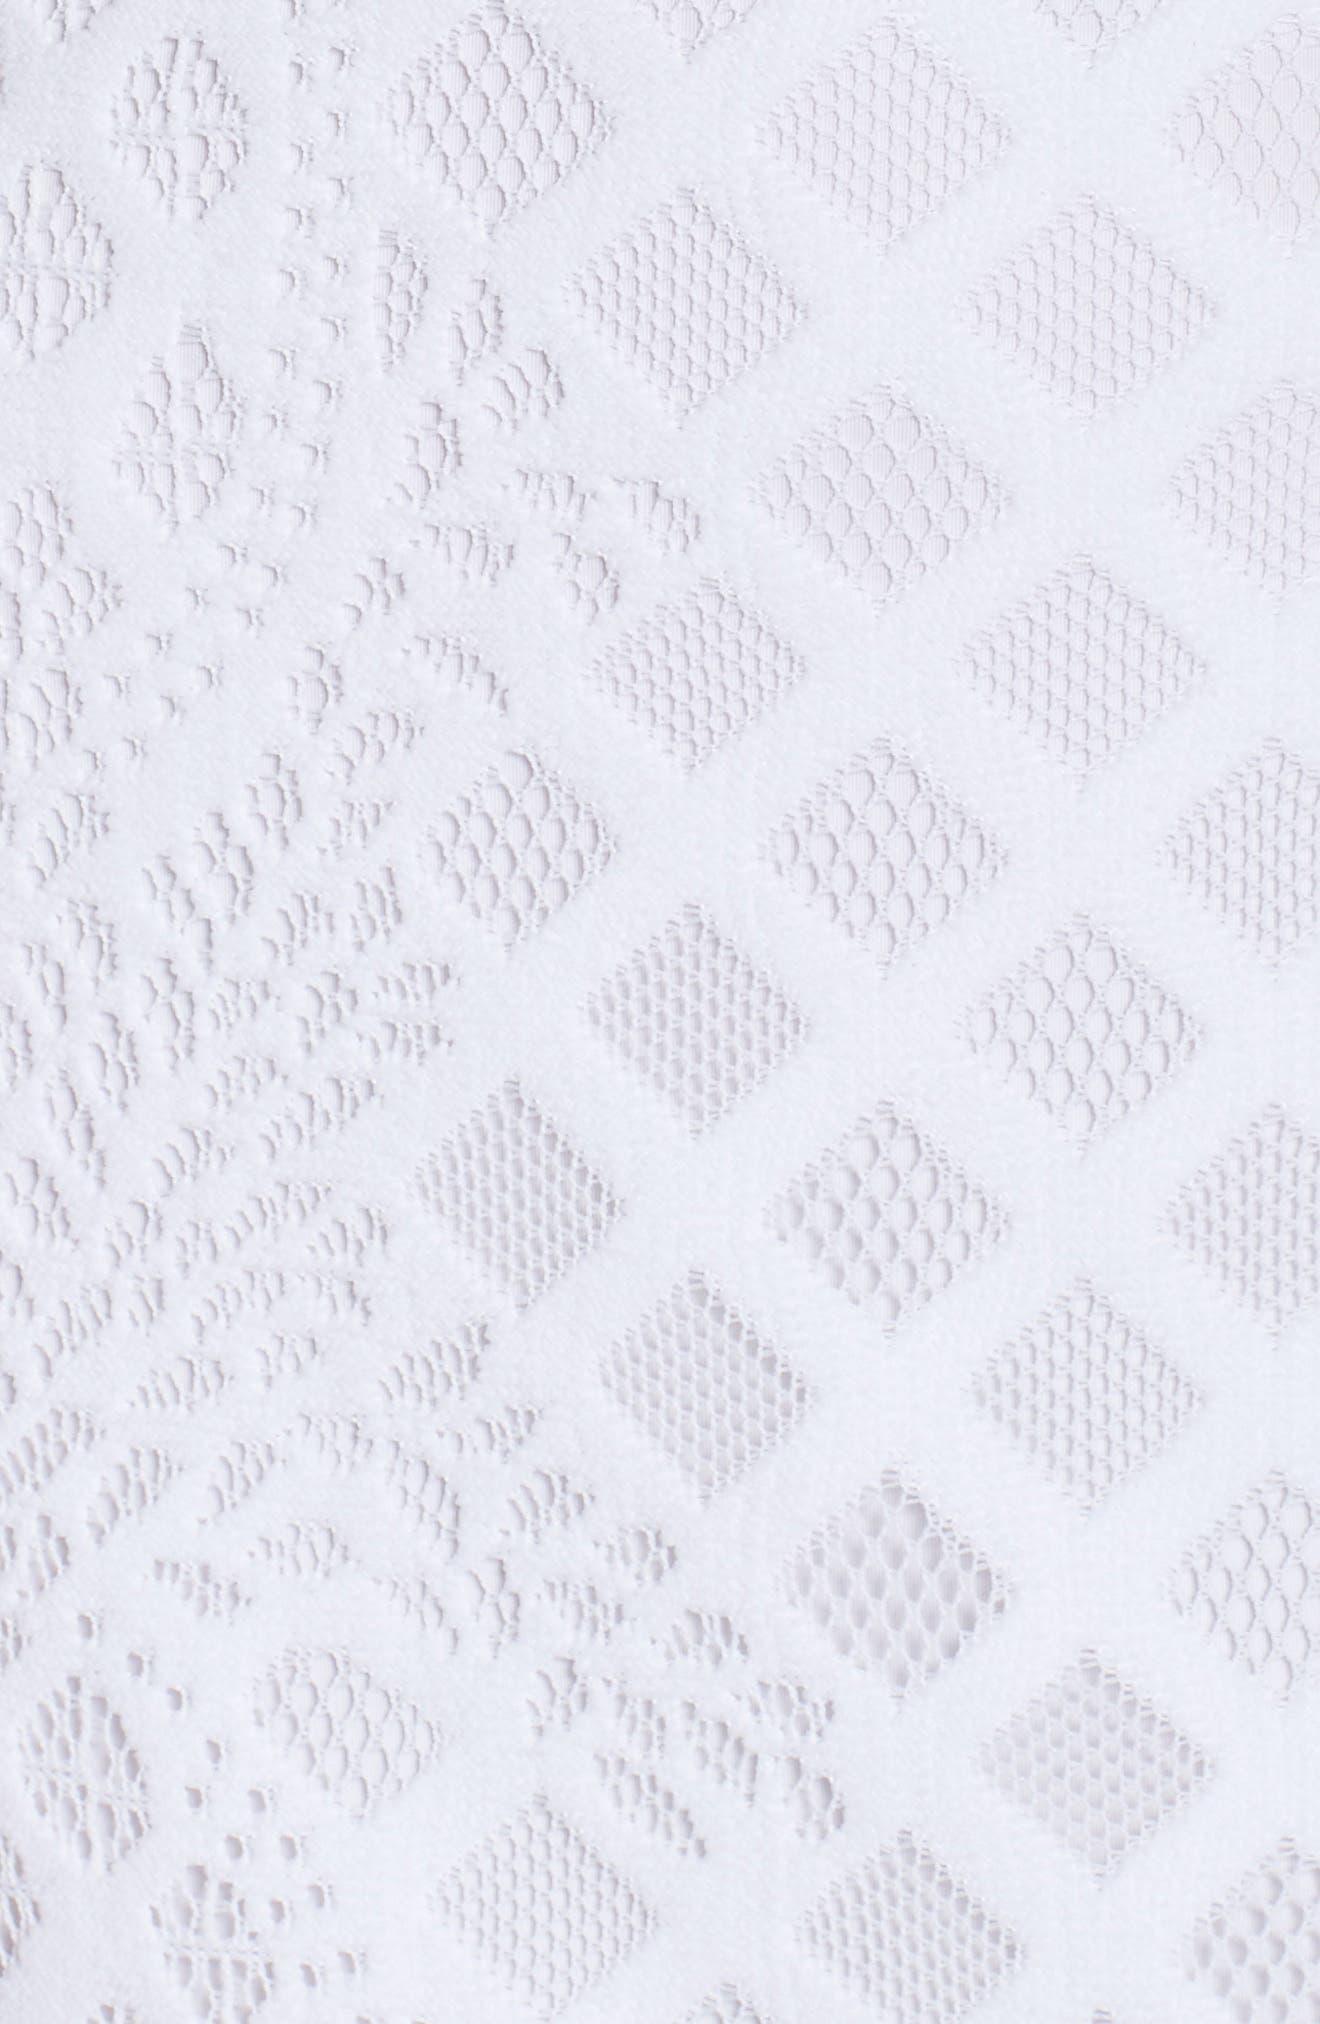 Pearl Maxi Dress,                             Alternate thumbnail 5, color,                             100